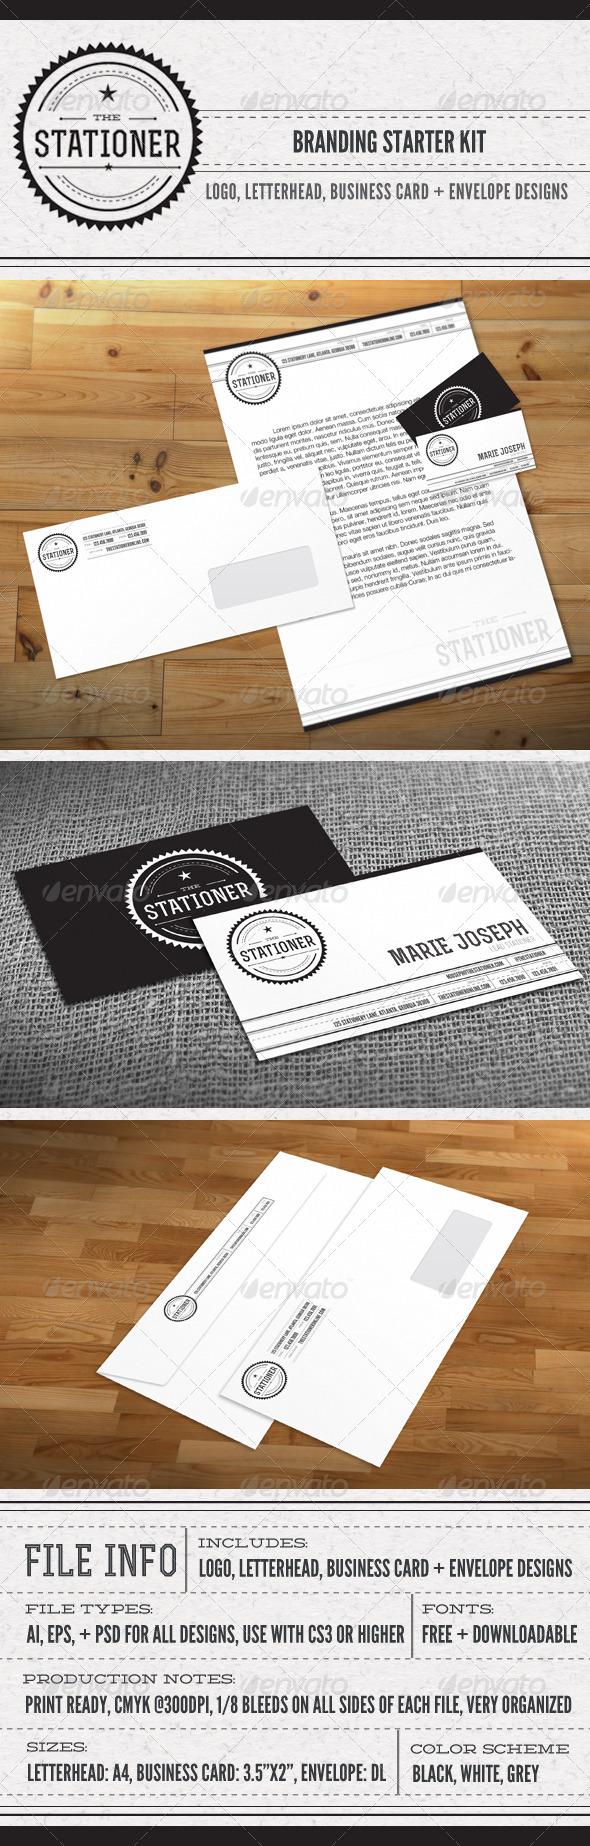 GraphicRiver The Stationer Branding Kit 1740126